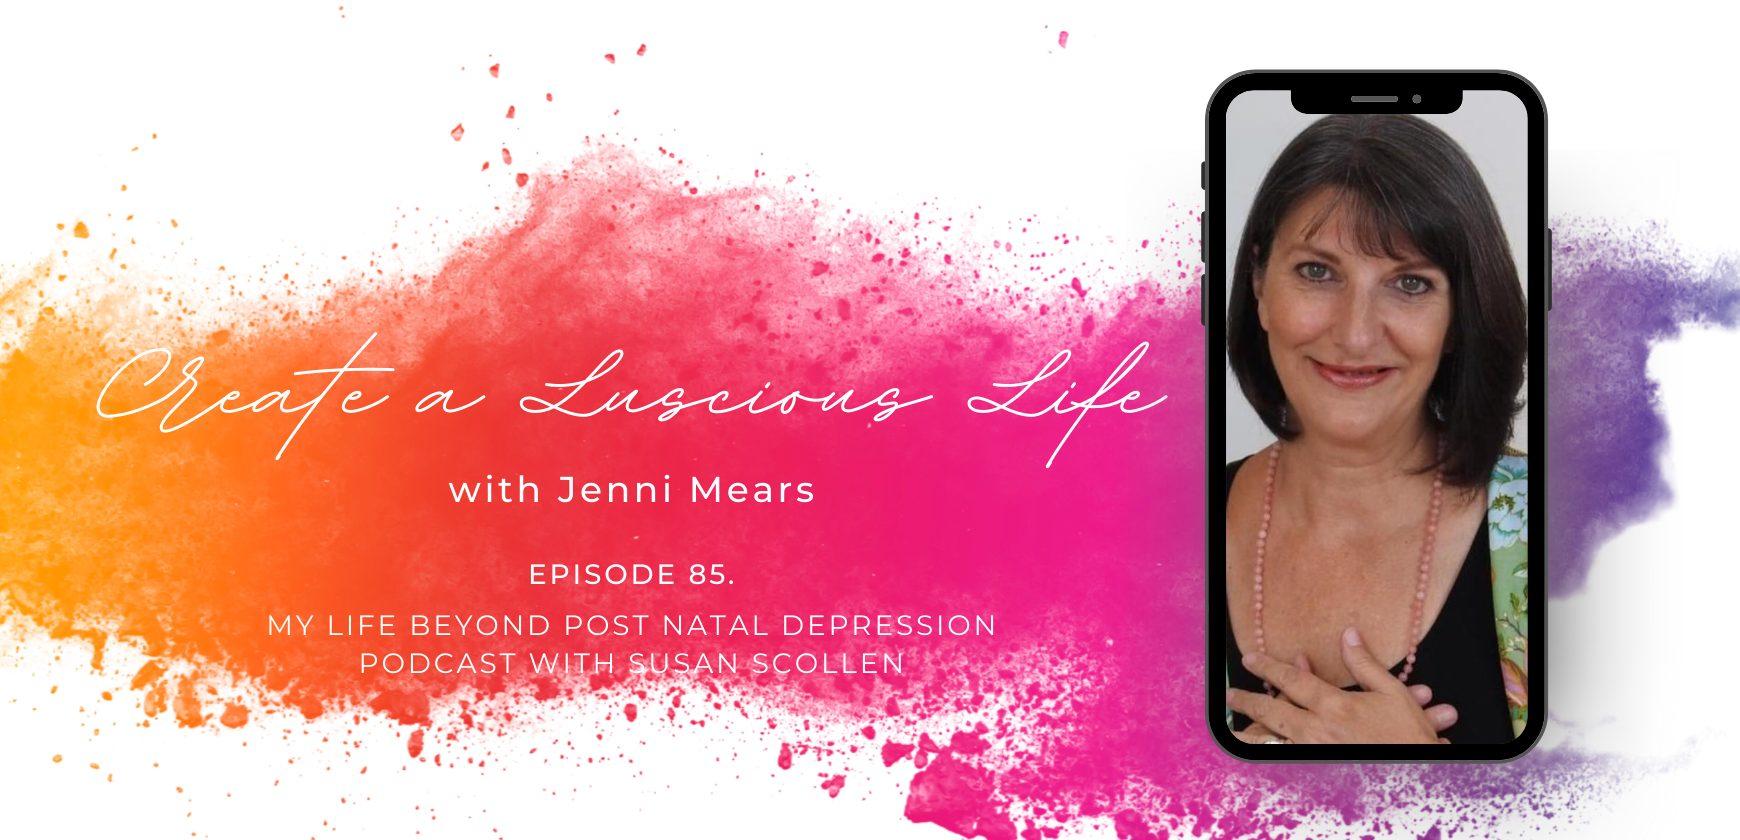 Create a Luscious Life with Jenni Mears